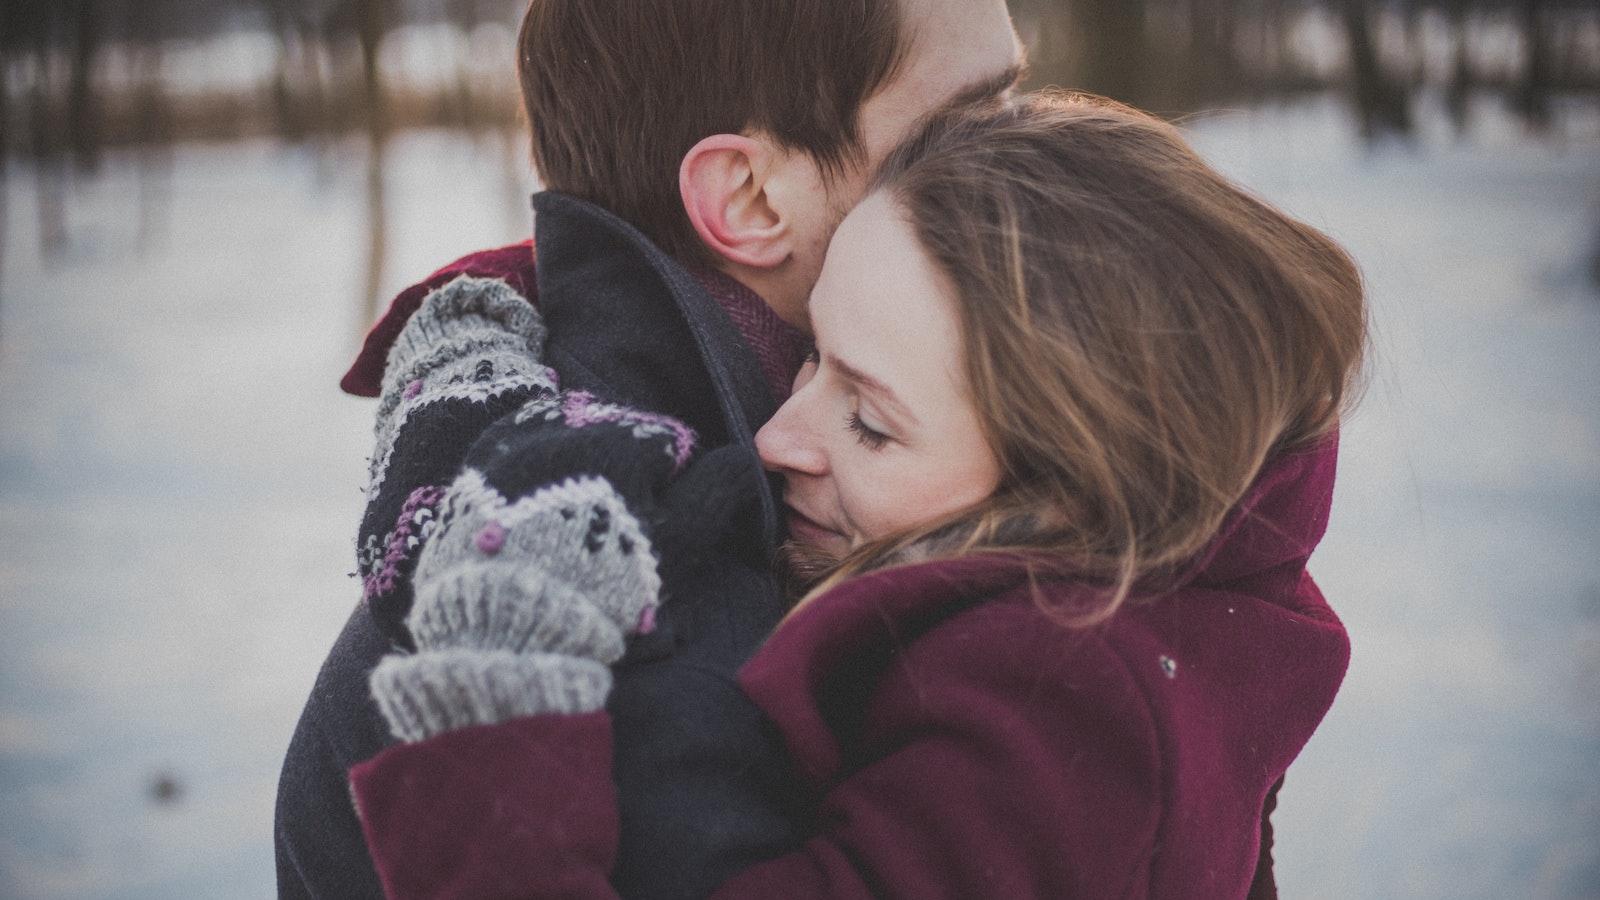 Hugging the opposite sex